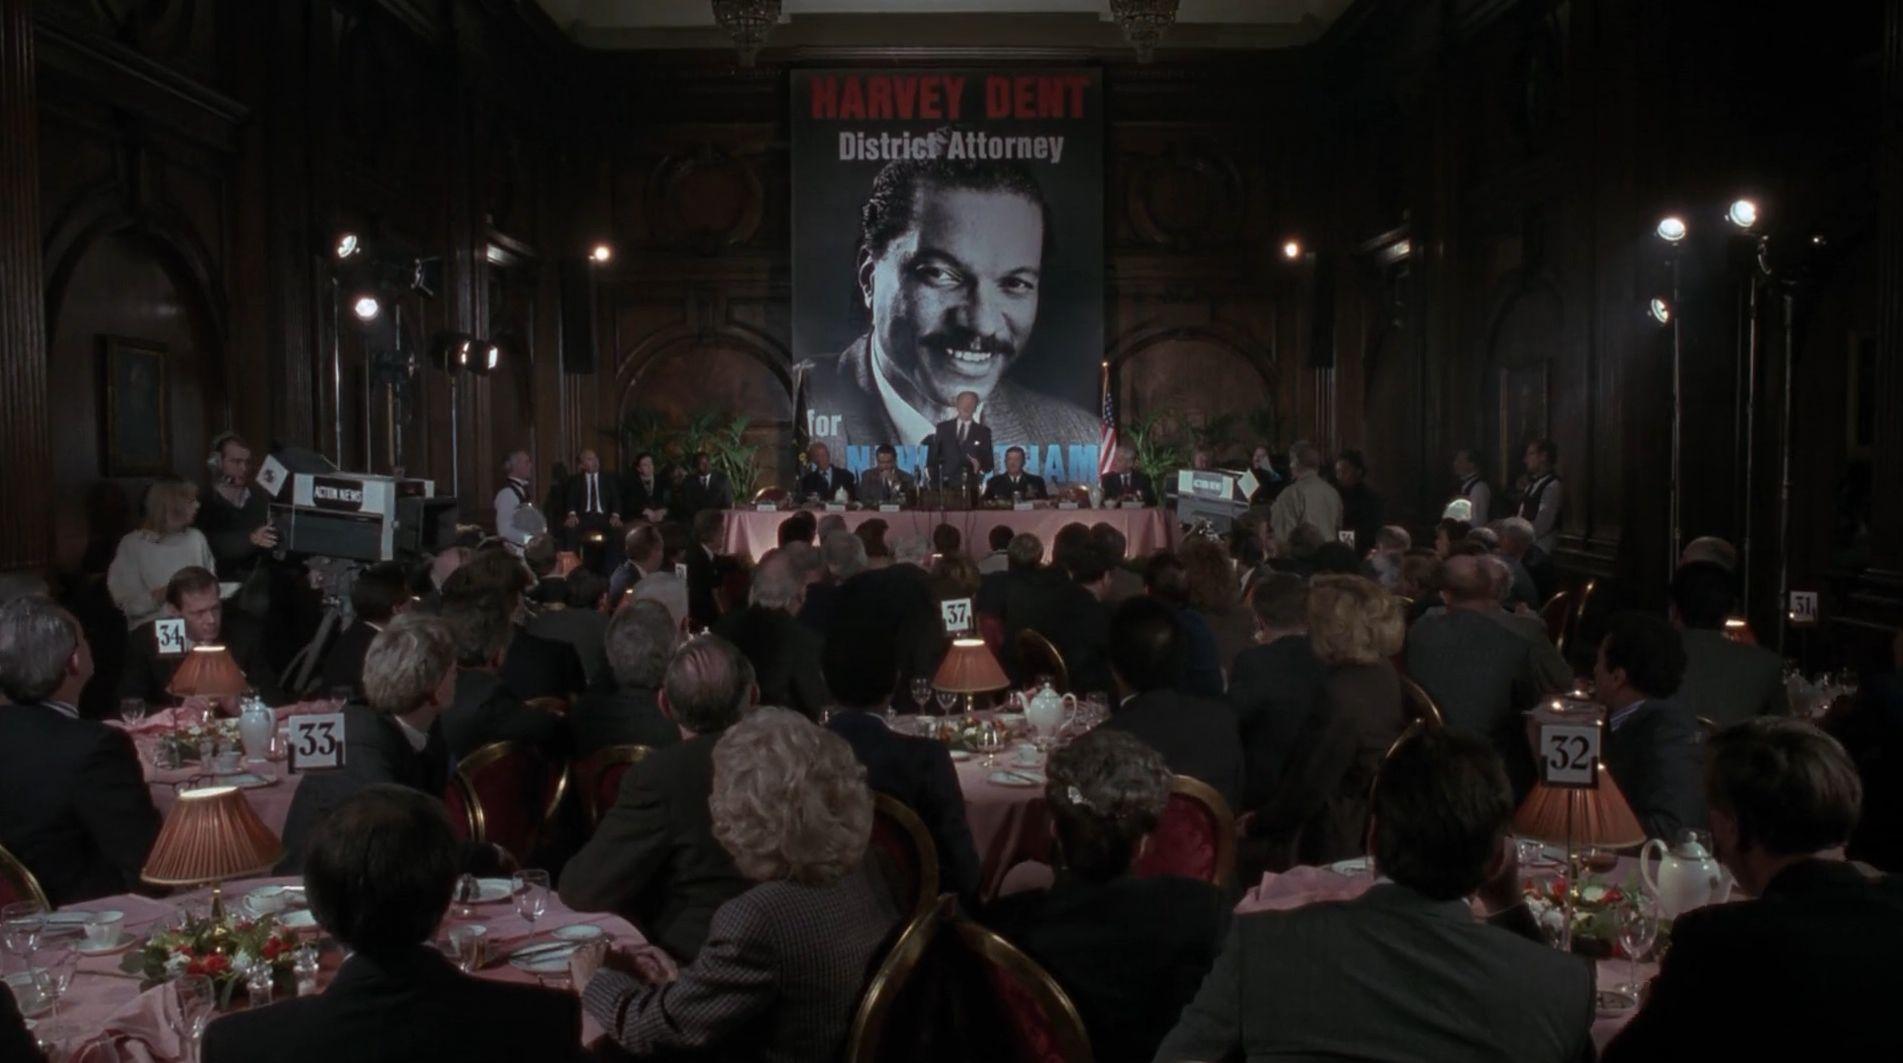 Billy Dee Williams as Harvey Dent